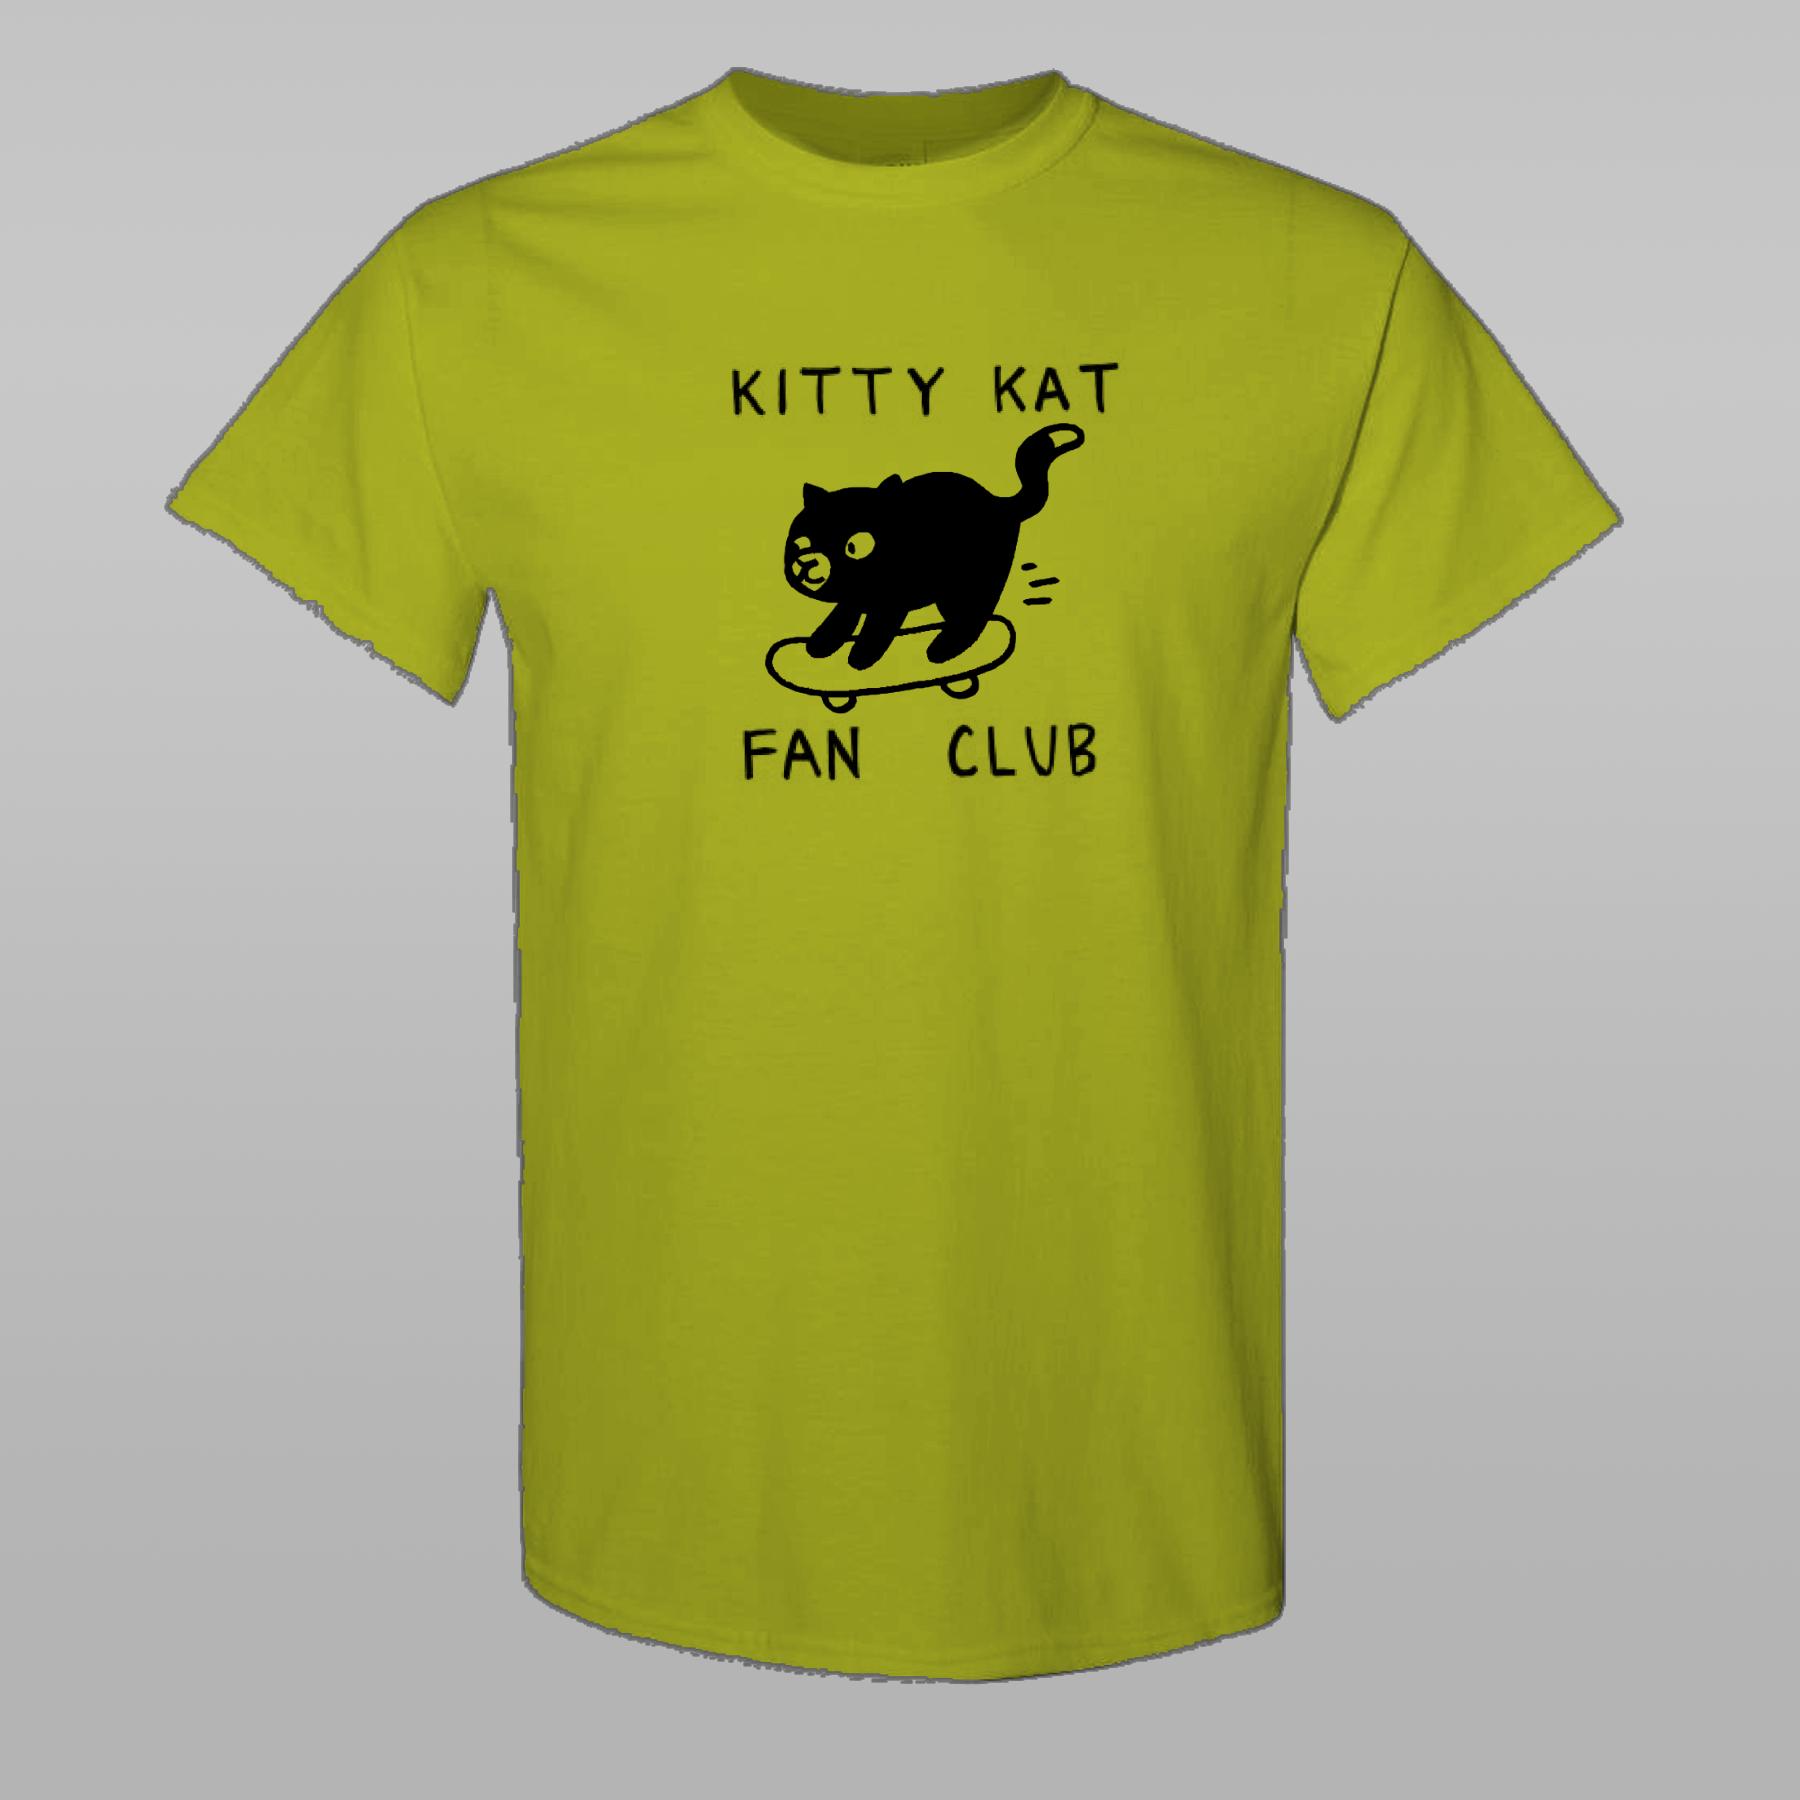 KITTY KAT FAN CLUB - Skateboard T-Shirt Yellow